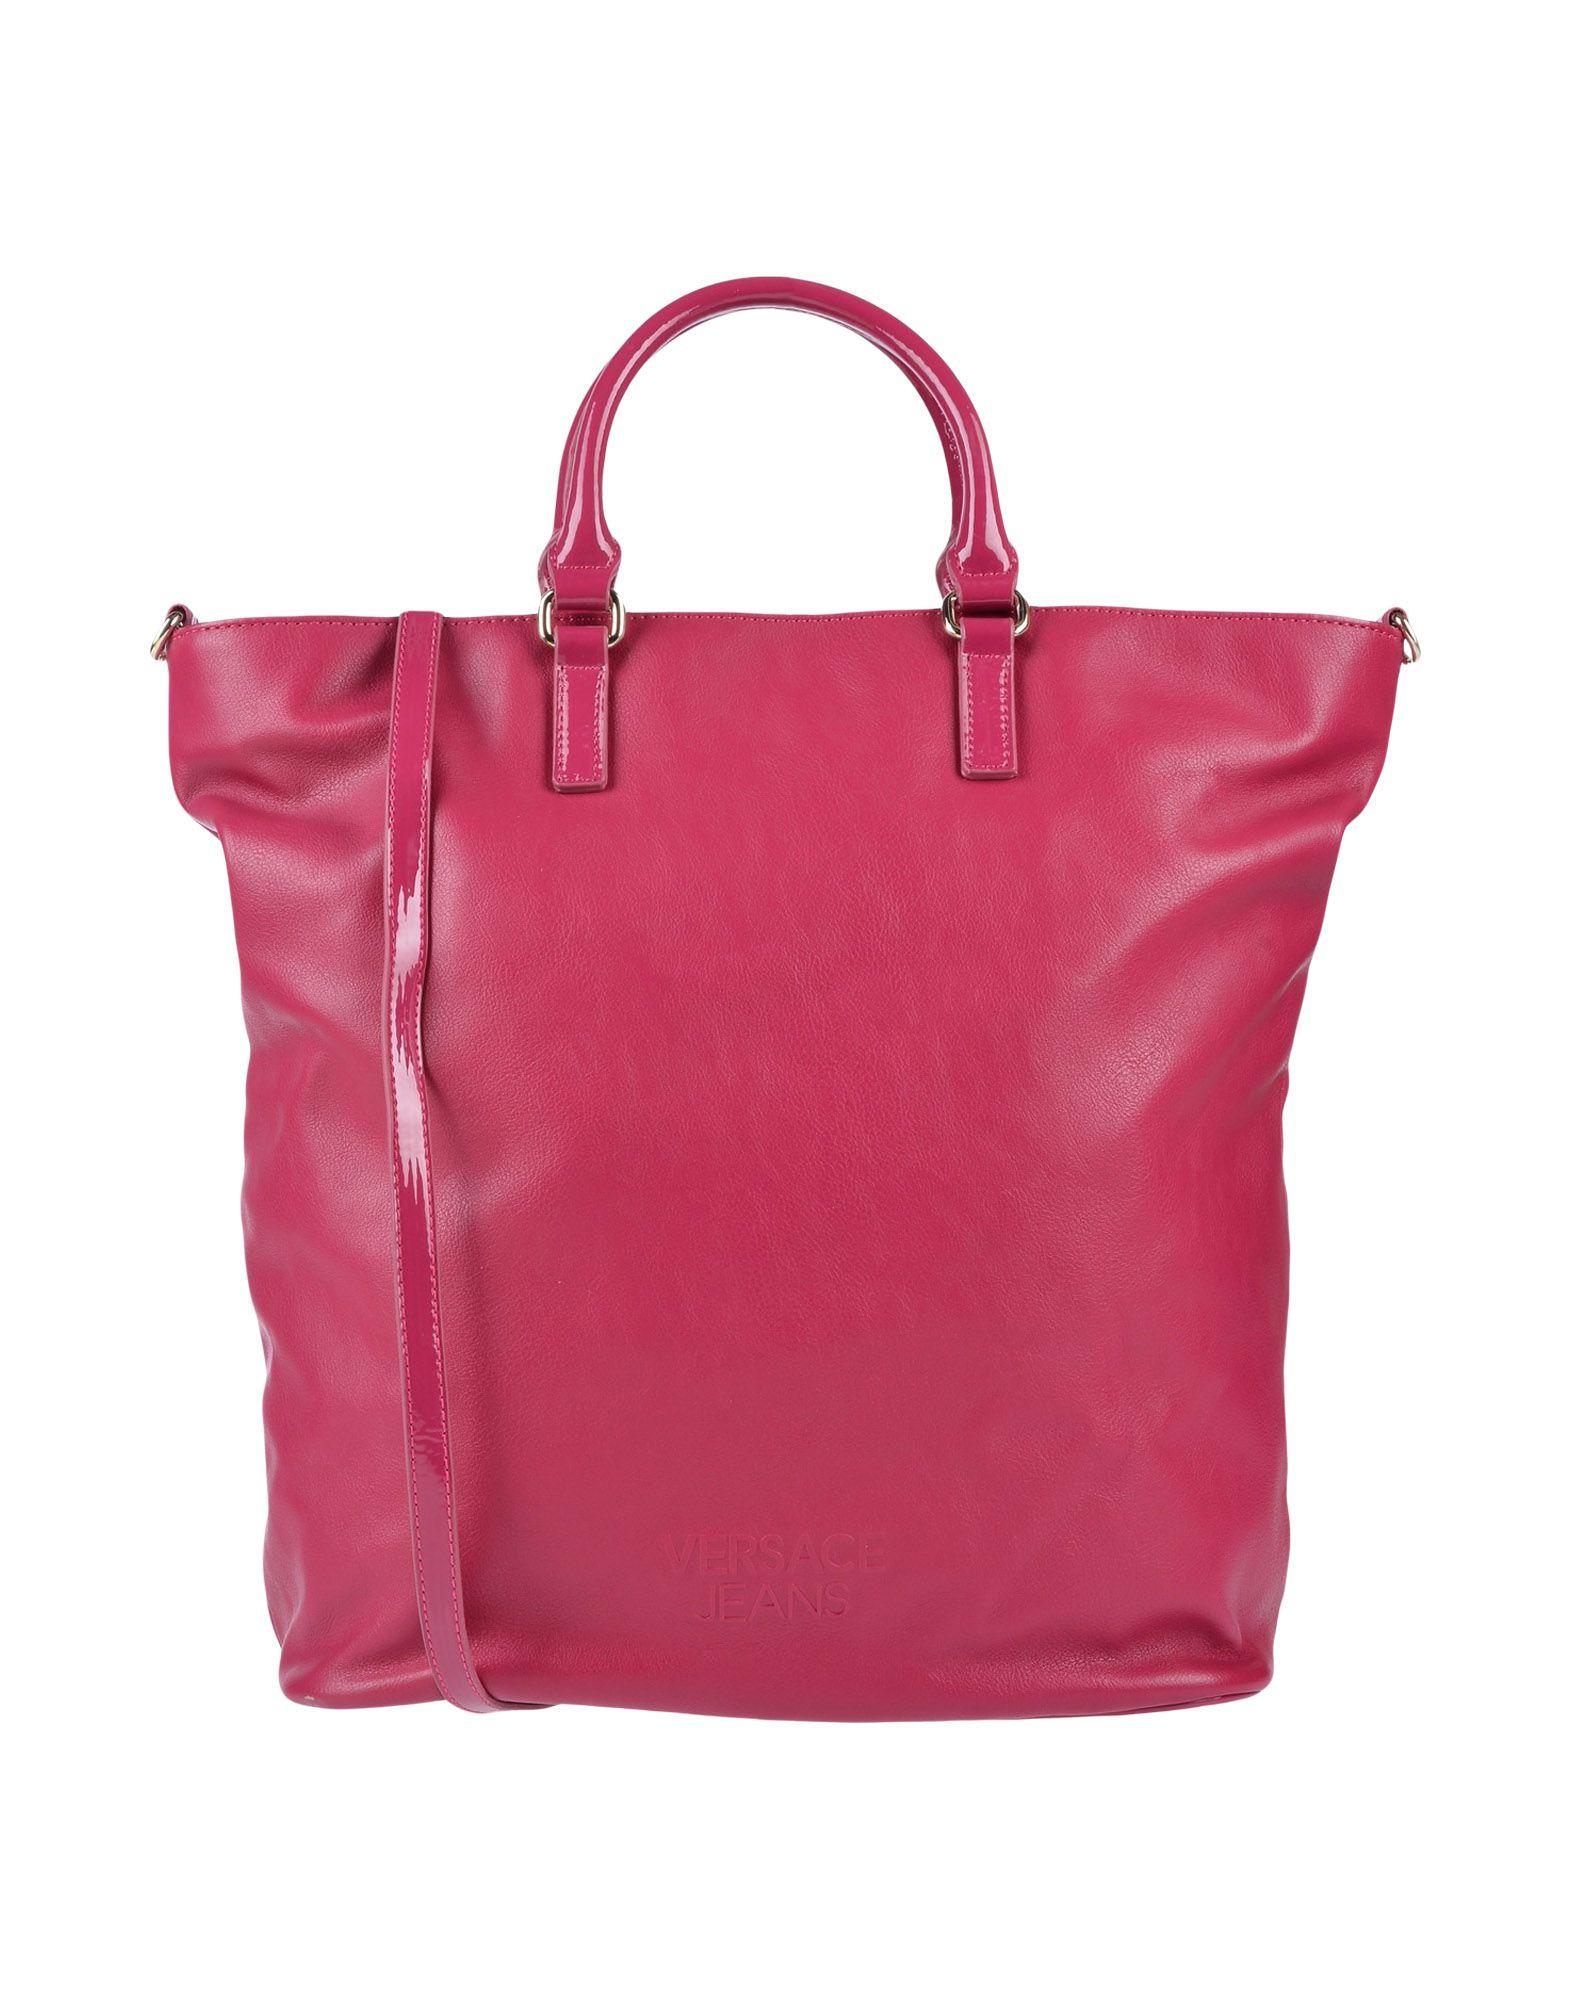 a6b2cd638d78 Versace Red Bag | Brydens Xpress